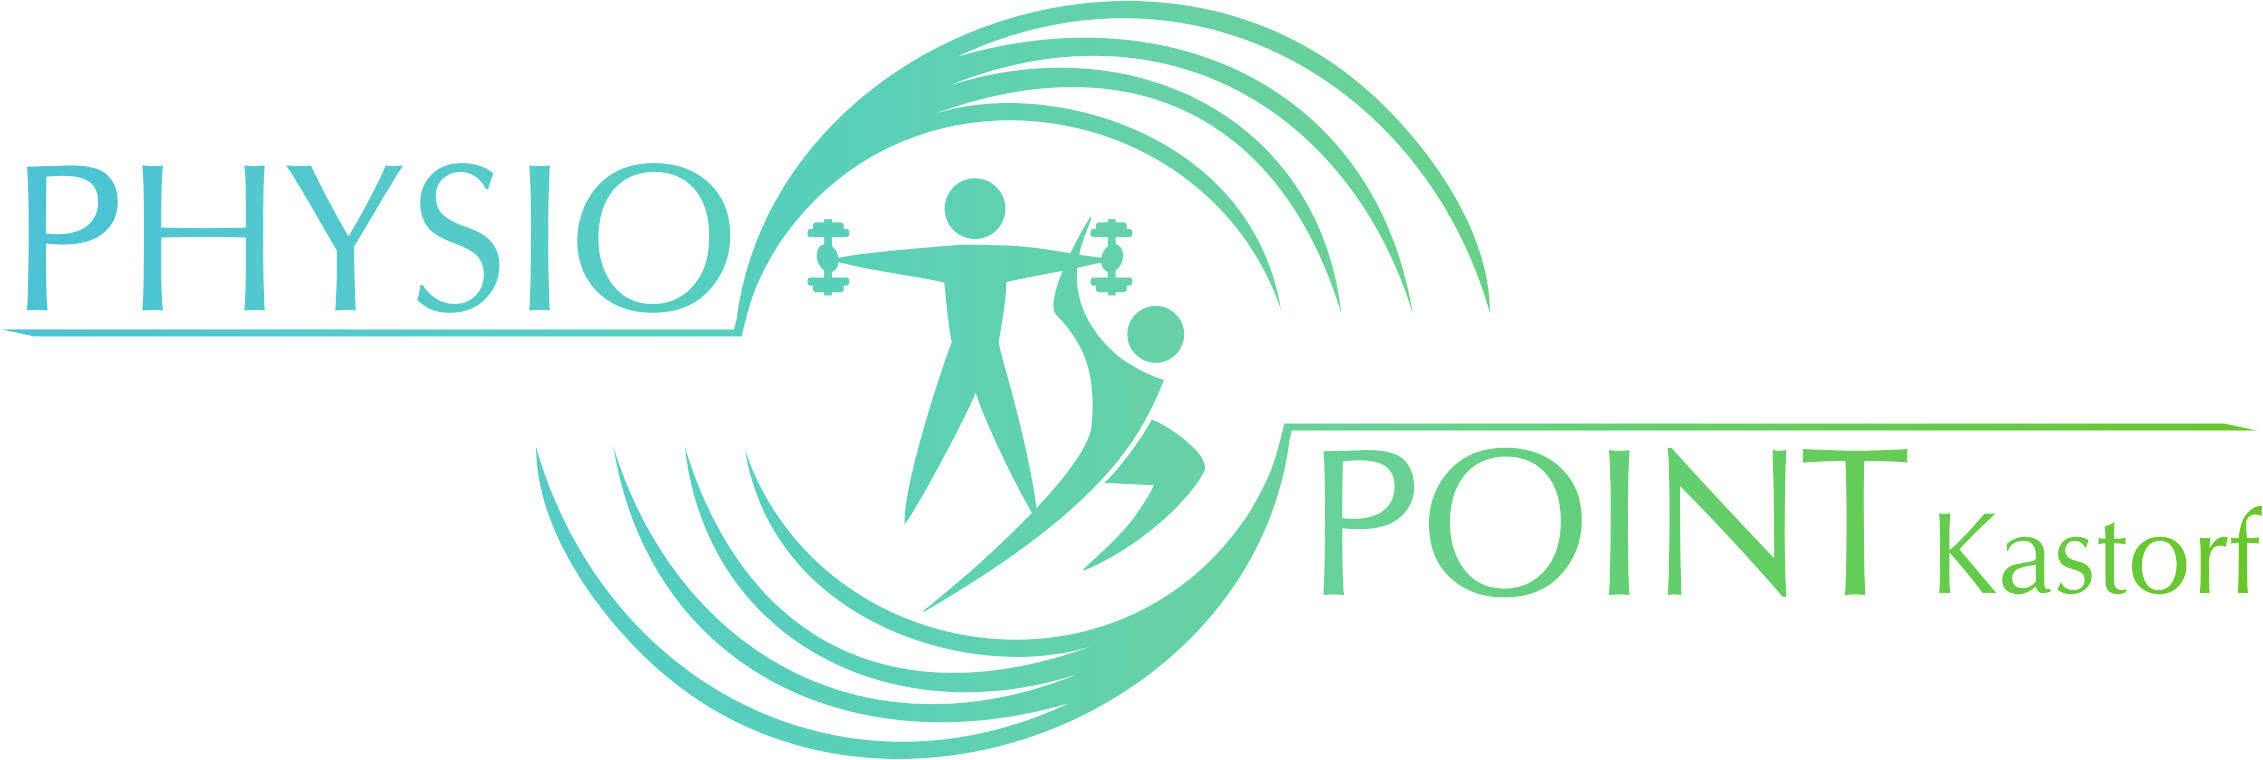 PhysioPoint-Kastorf Logo